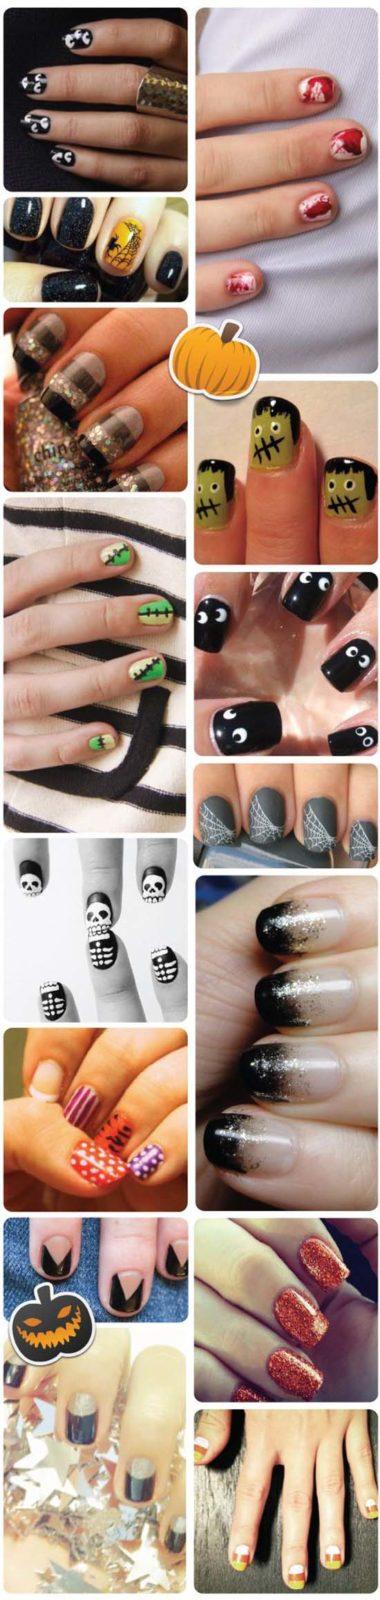 cool Fingernail Designs 2